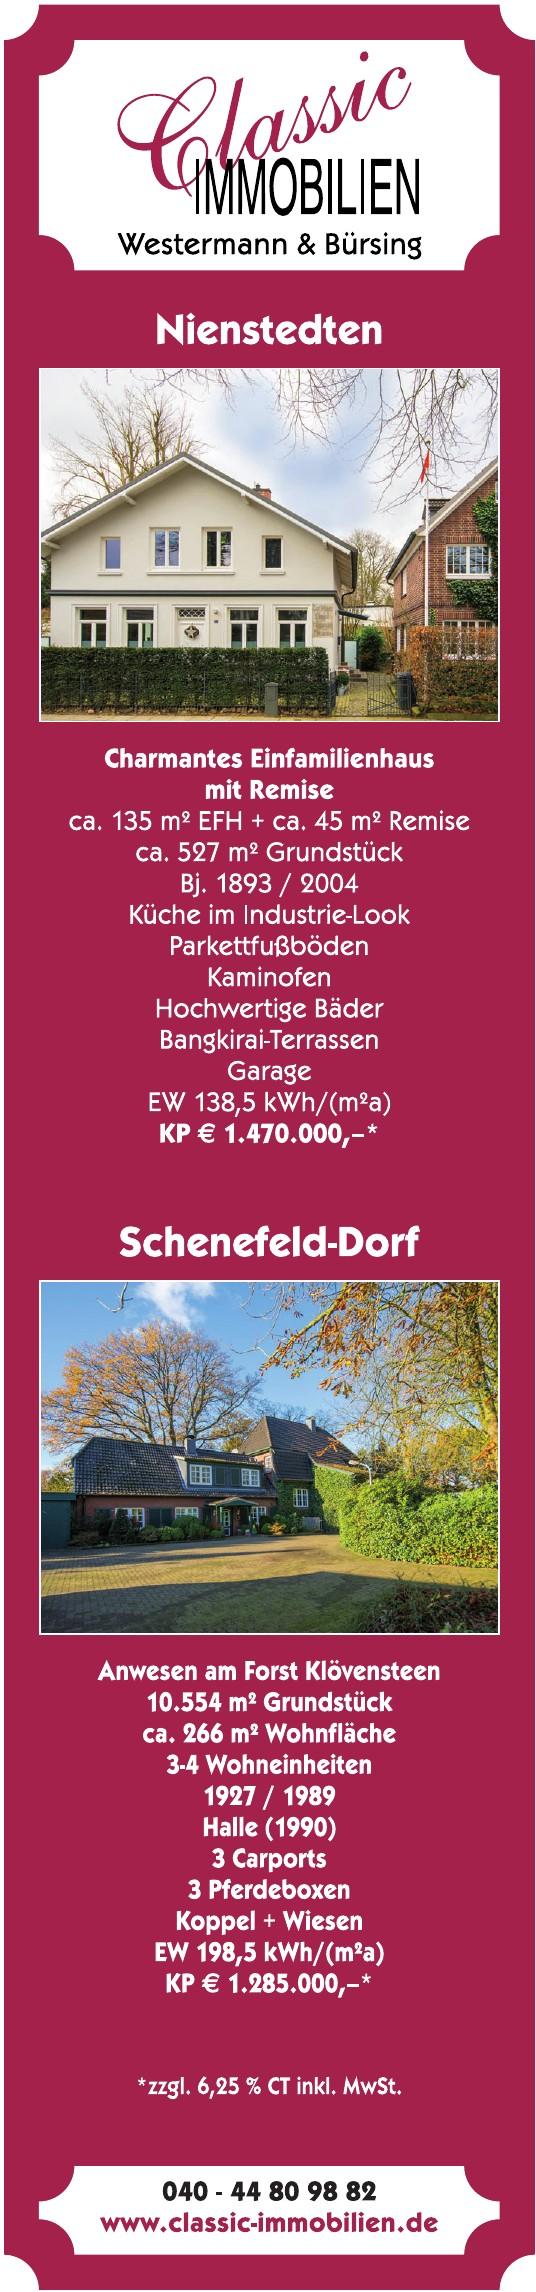 Classic Immobilien Westermann & Bürsing